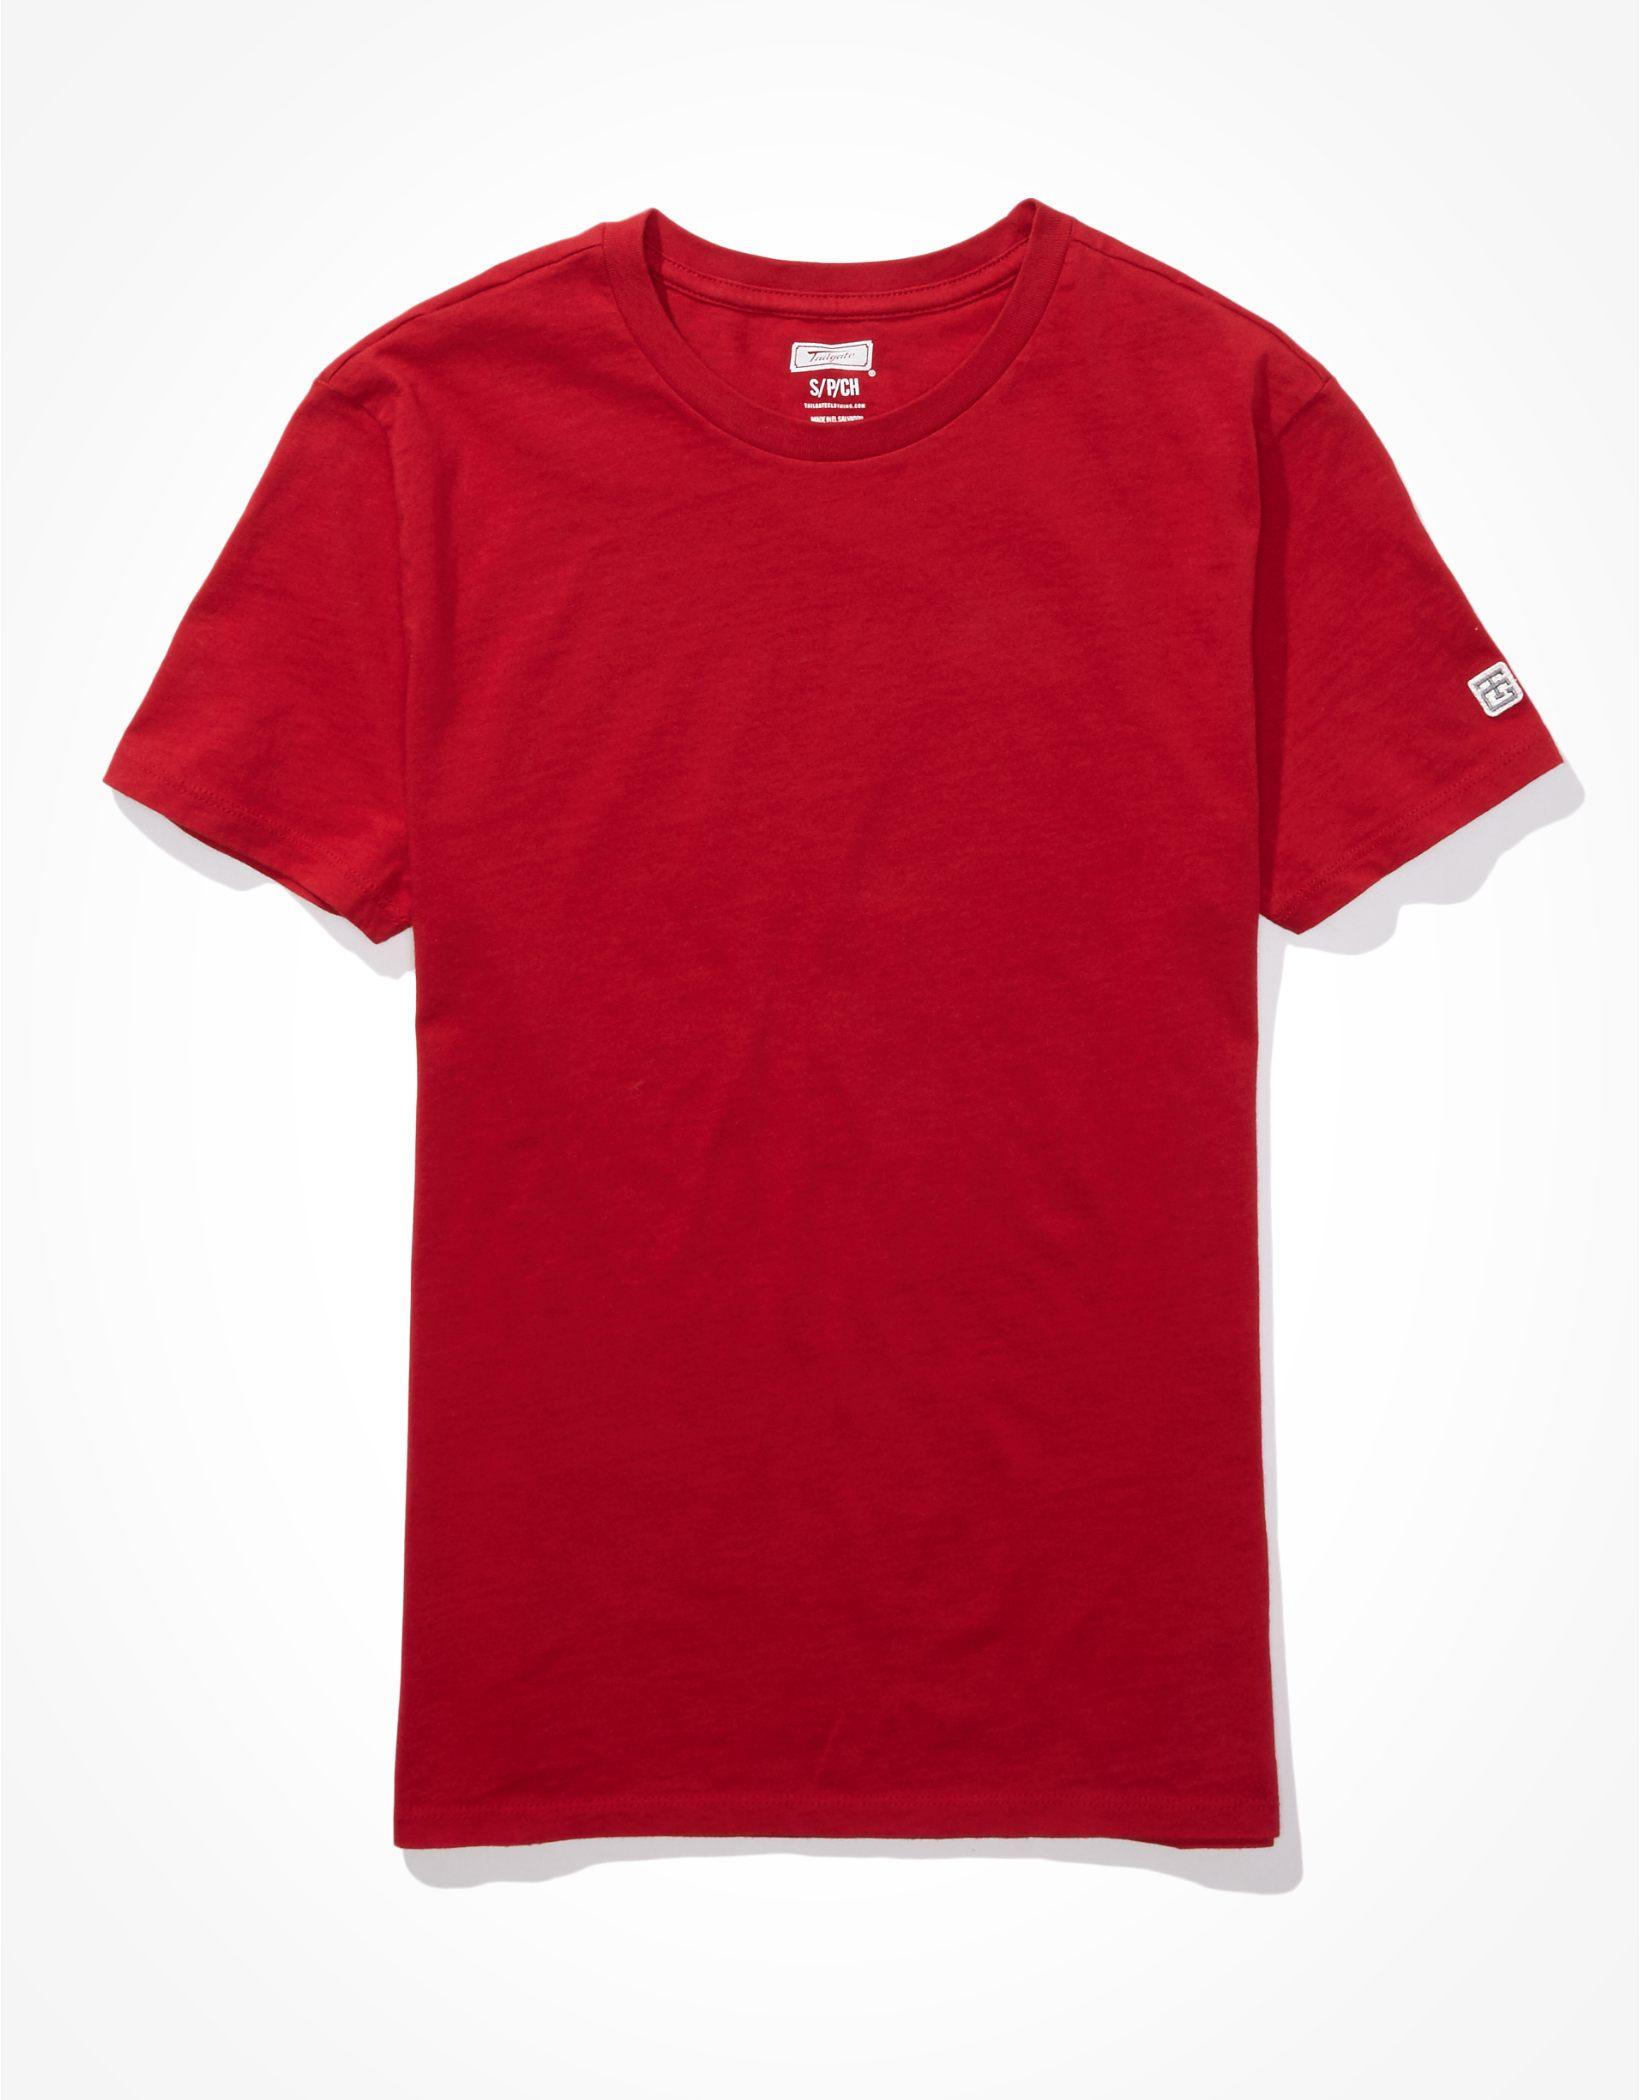 Tailgate Women's Essential Cotton Jersey T-Shirt